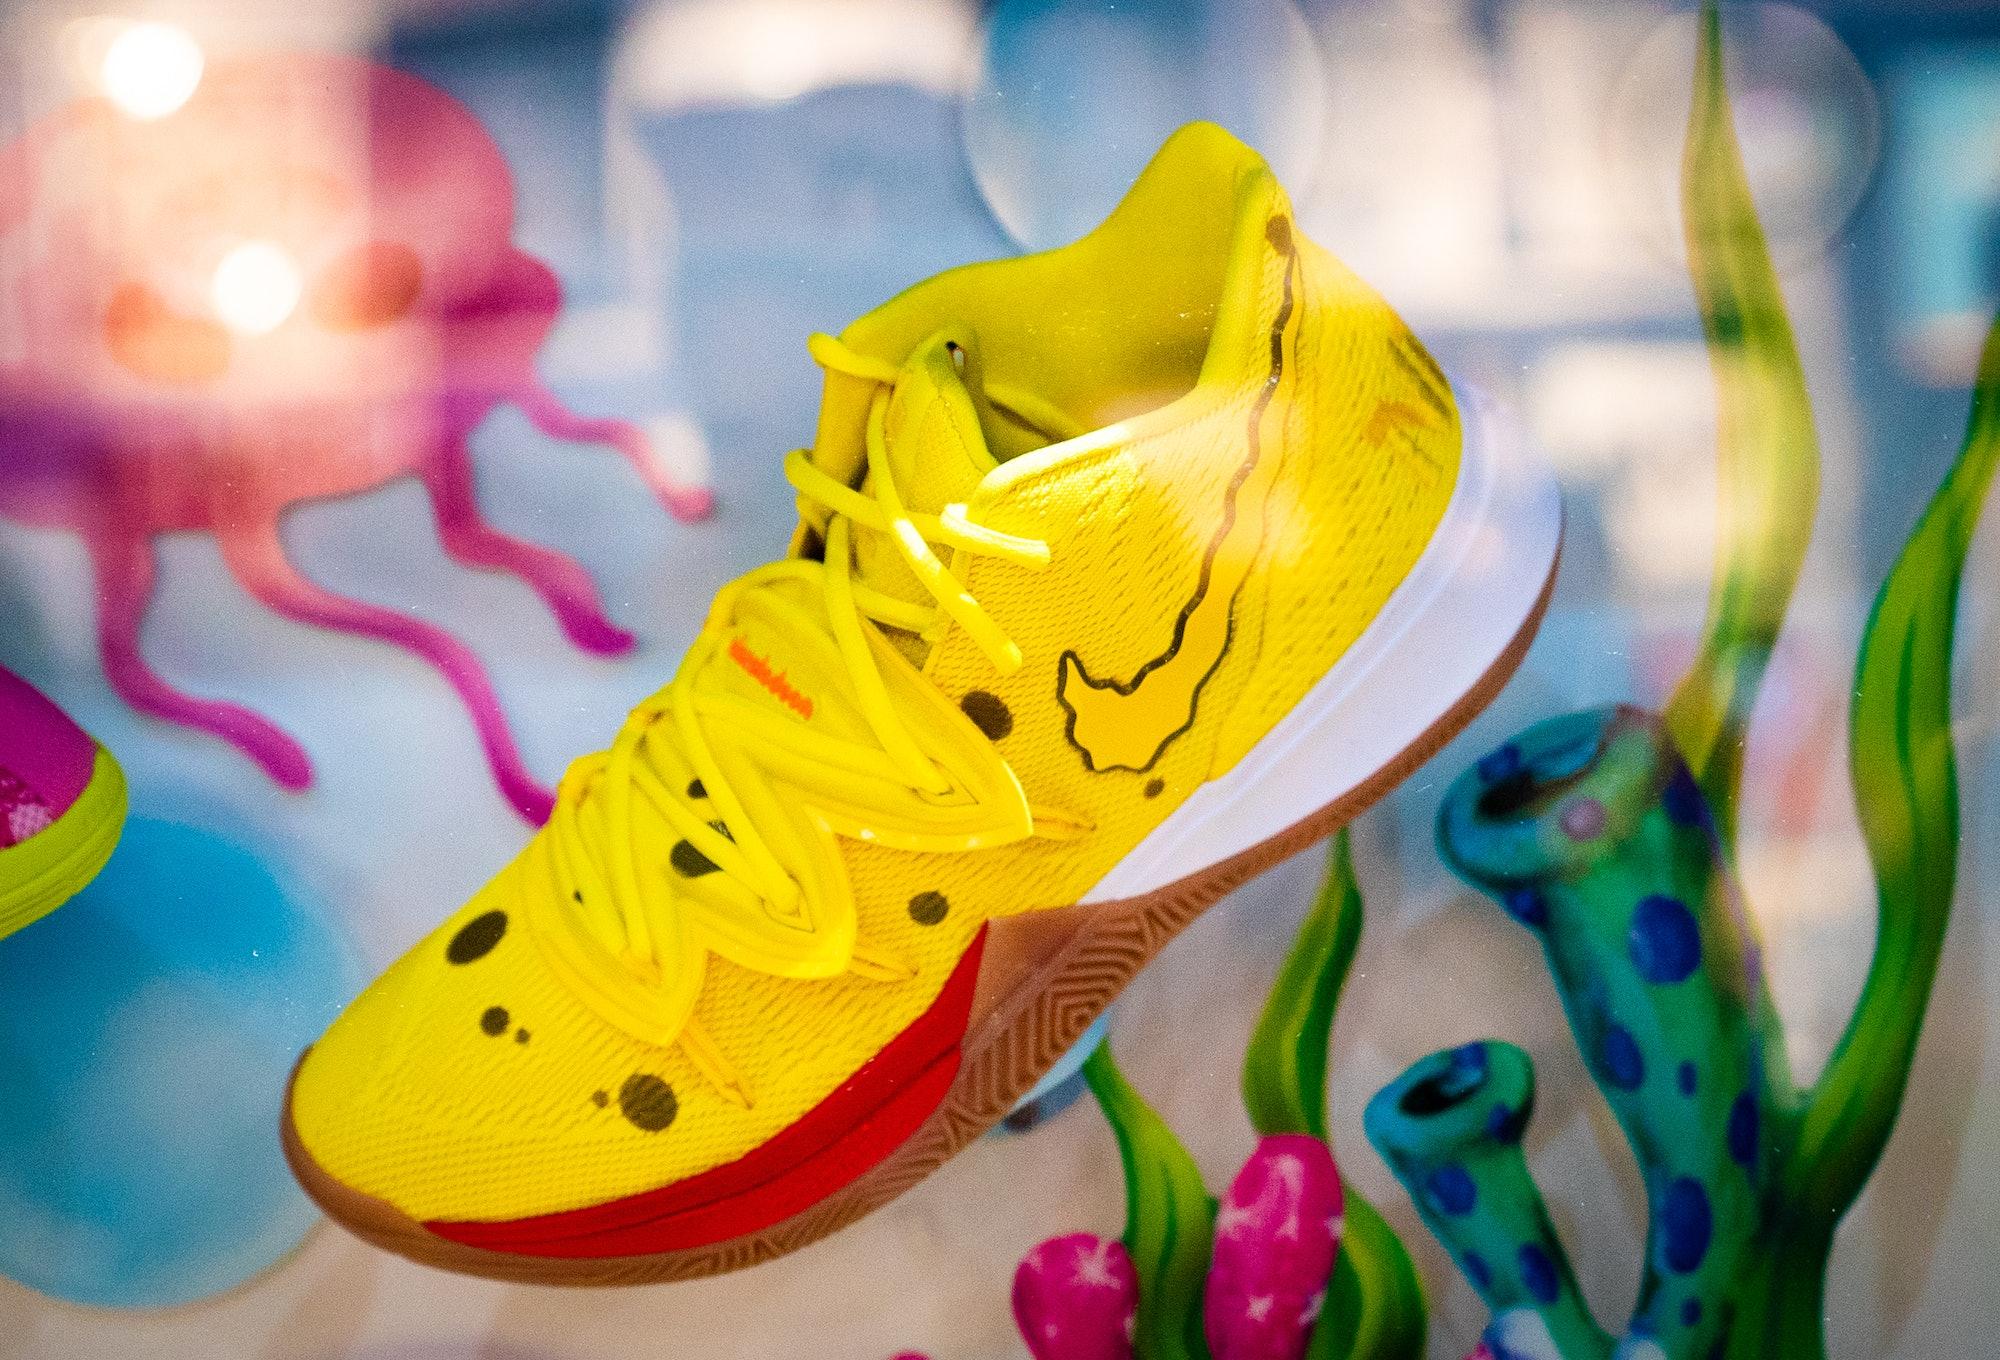 Nike x Spongebob Squarepants Shoe Collaboration SDCC50 2019